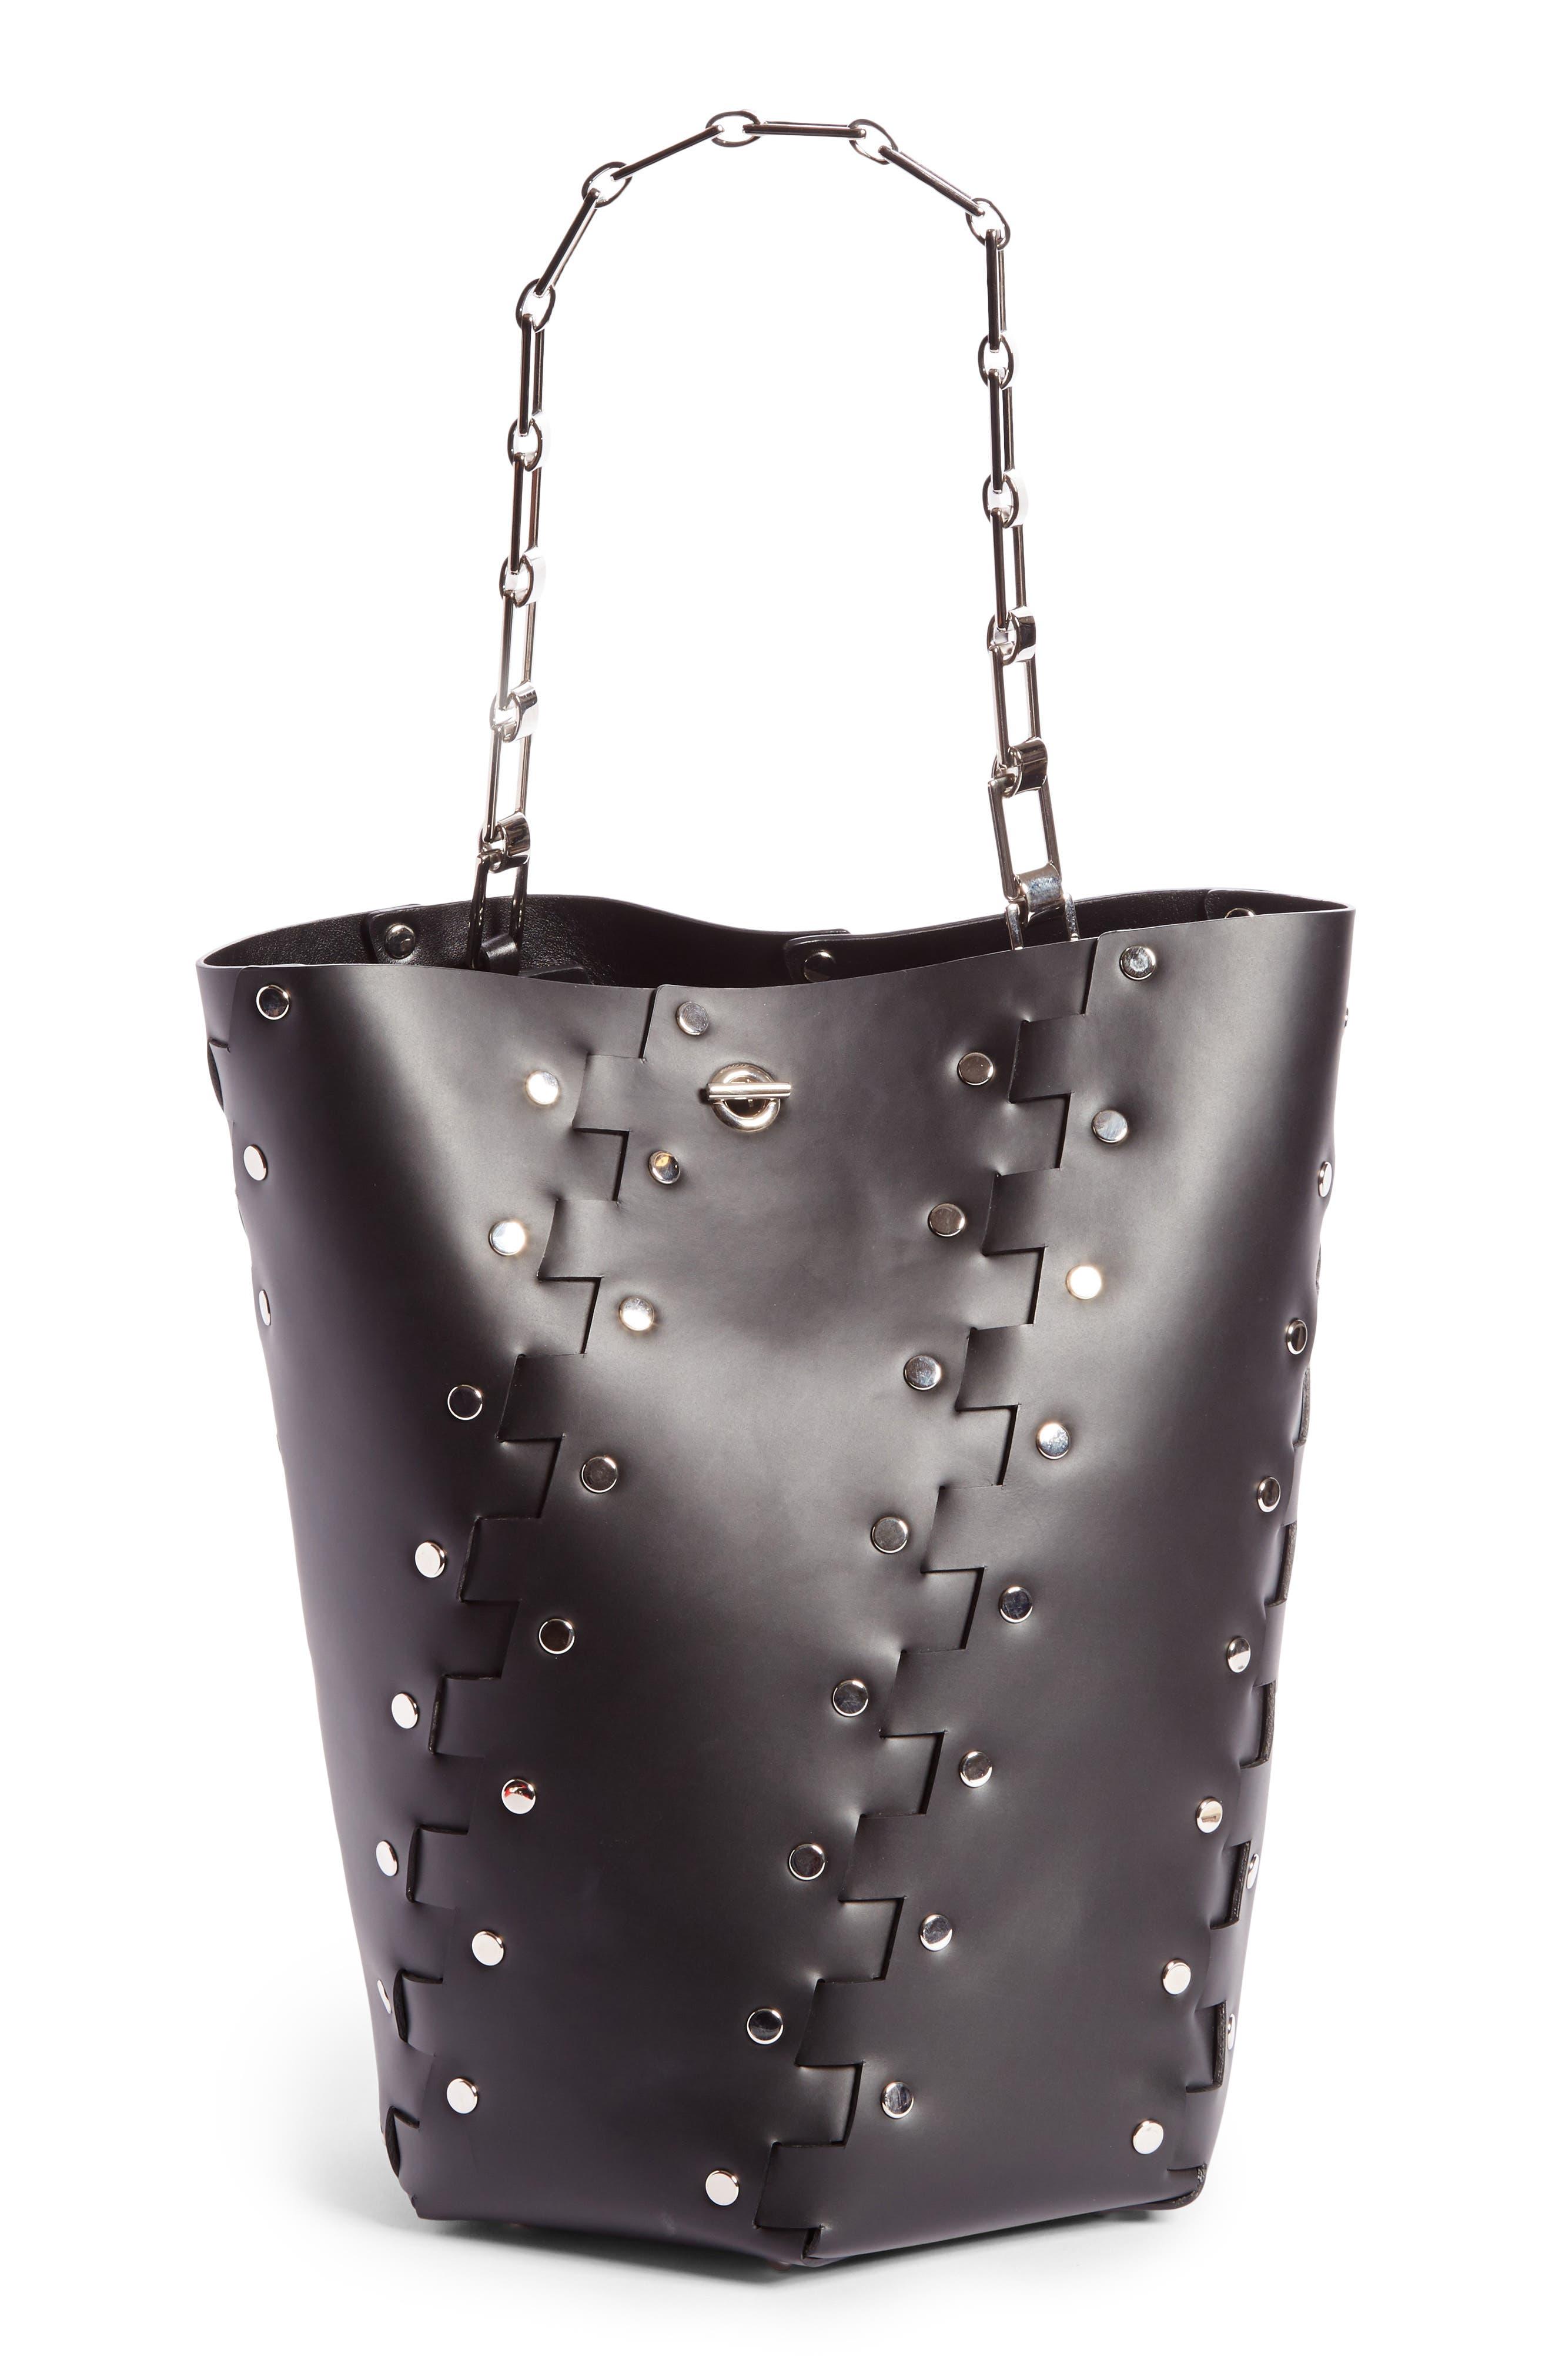 Main Image - Proenza Schouler Medium Hex Studded Leather Bucket Bag